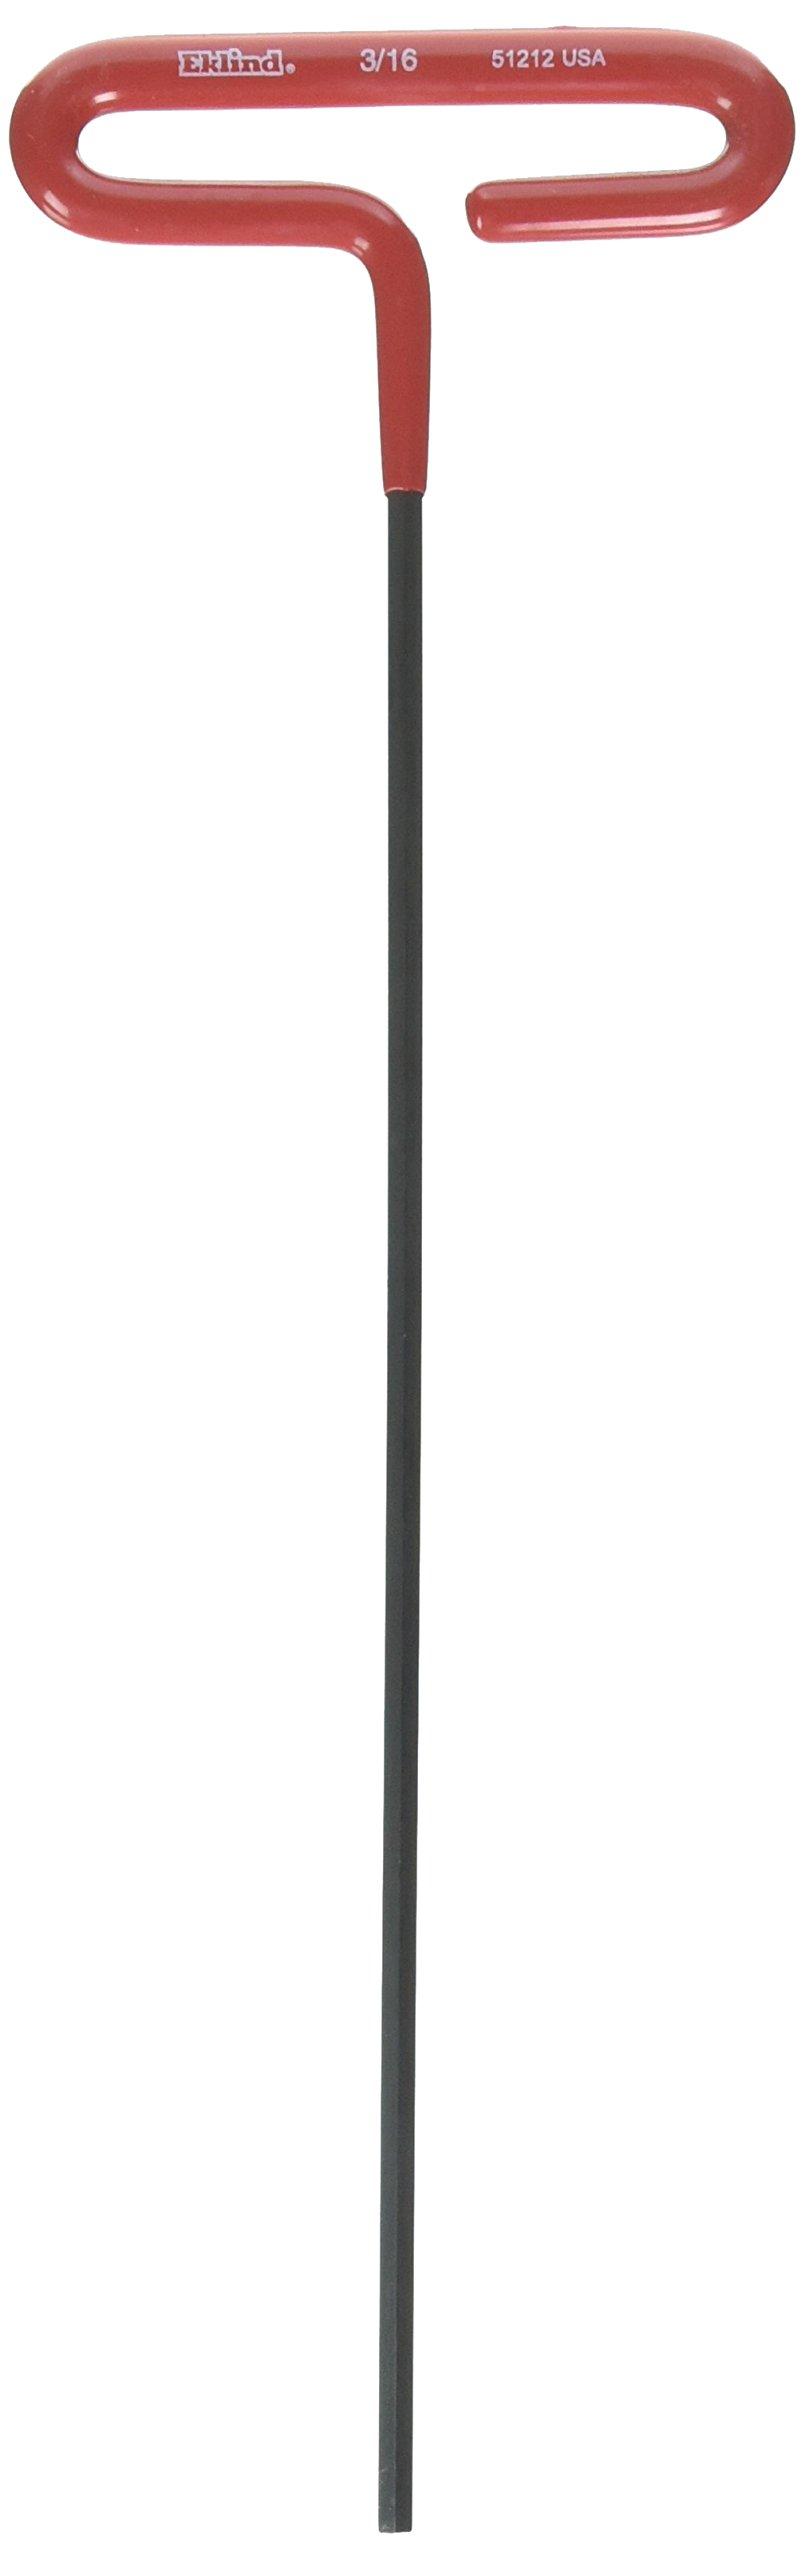 Eklind 54691 Cush Grip Hex 11mm 6 Arm T-Key